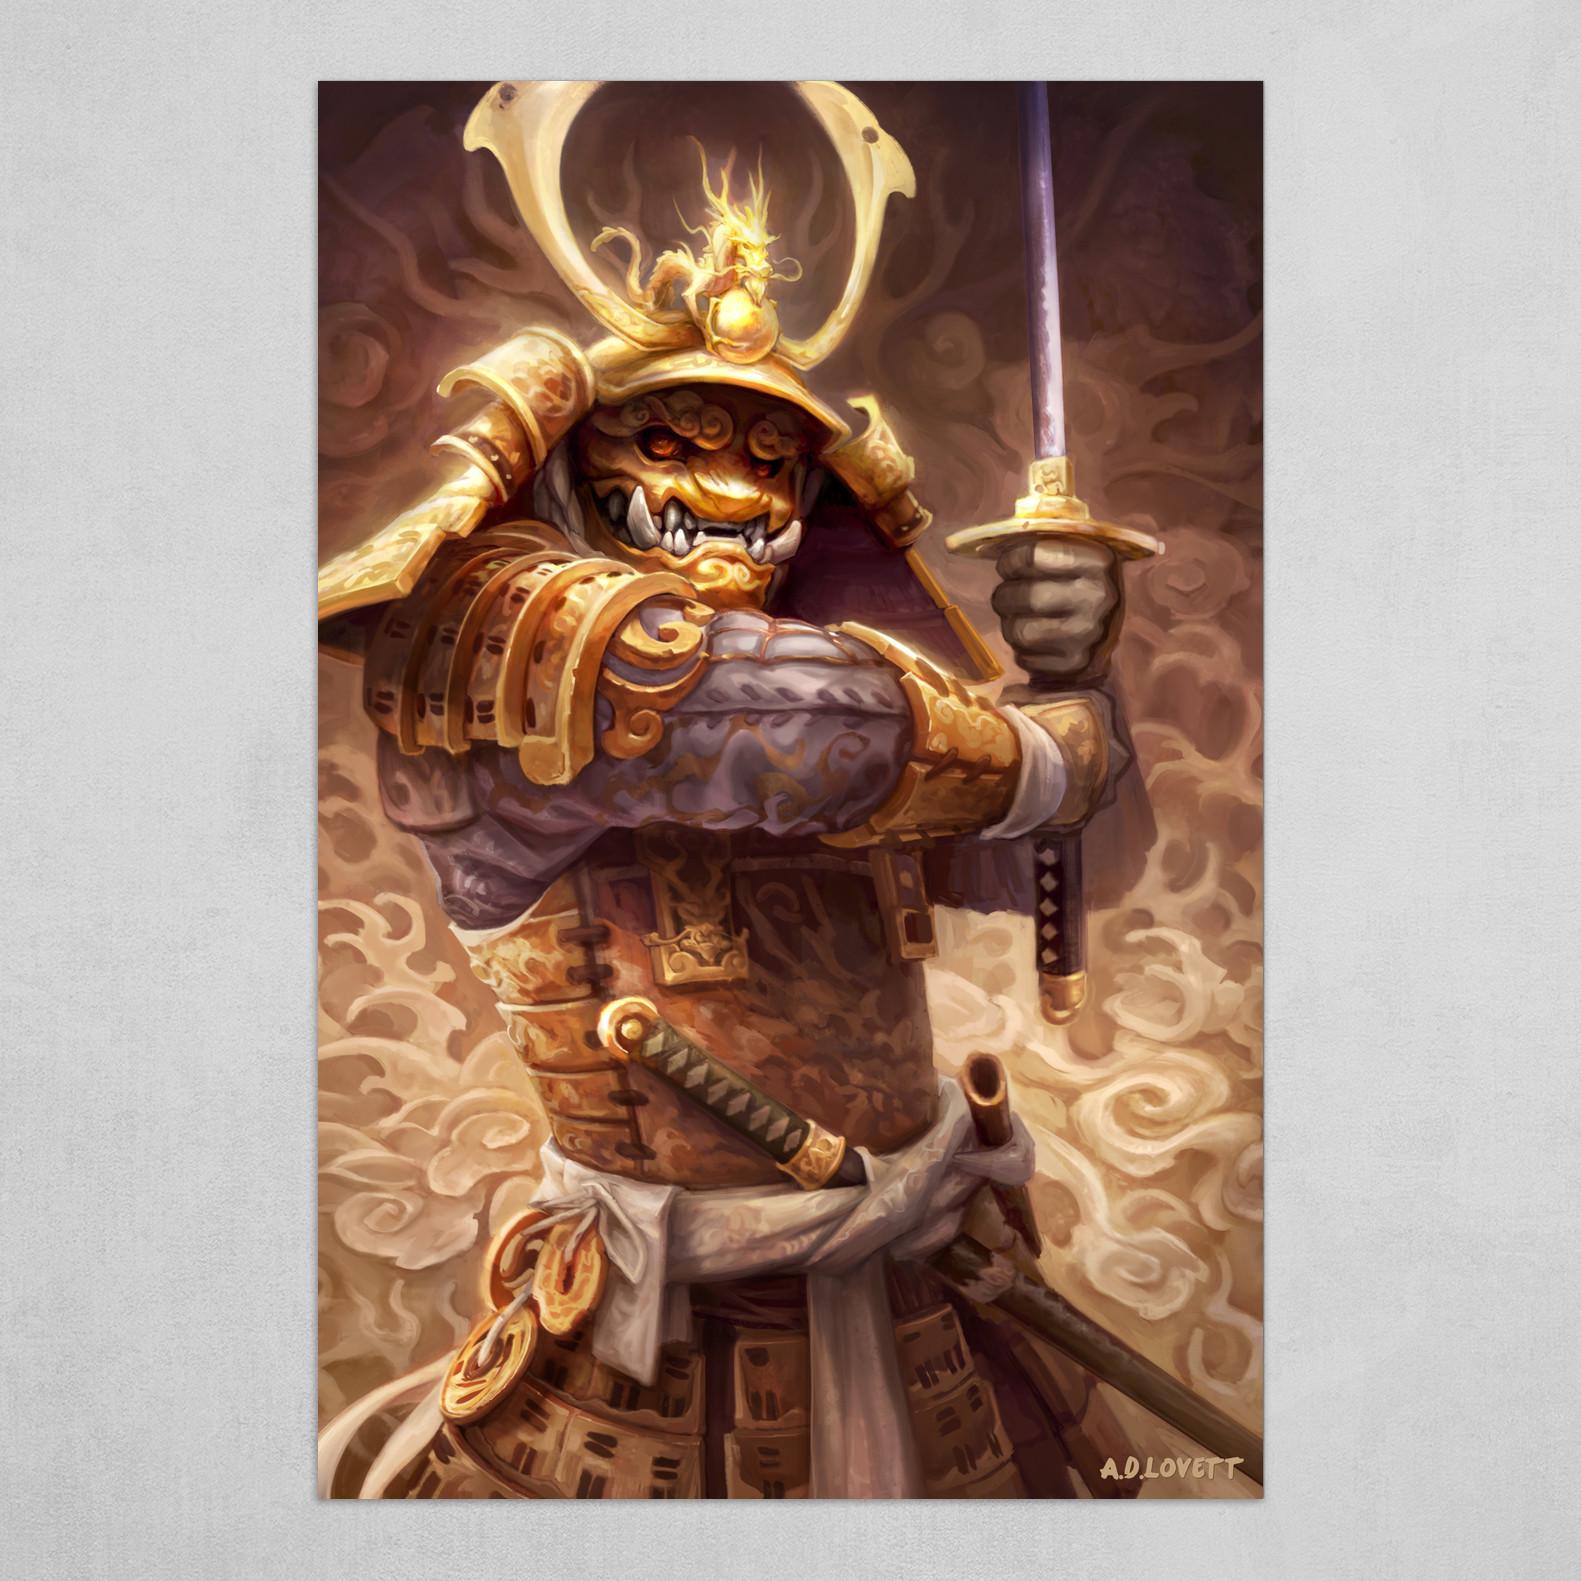 Golden Samurai